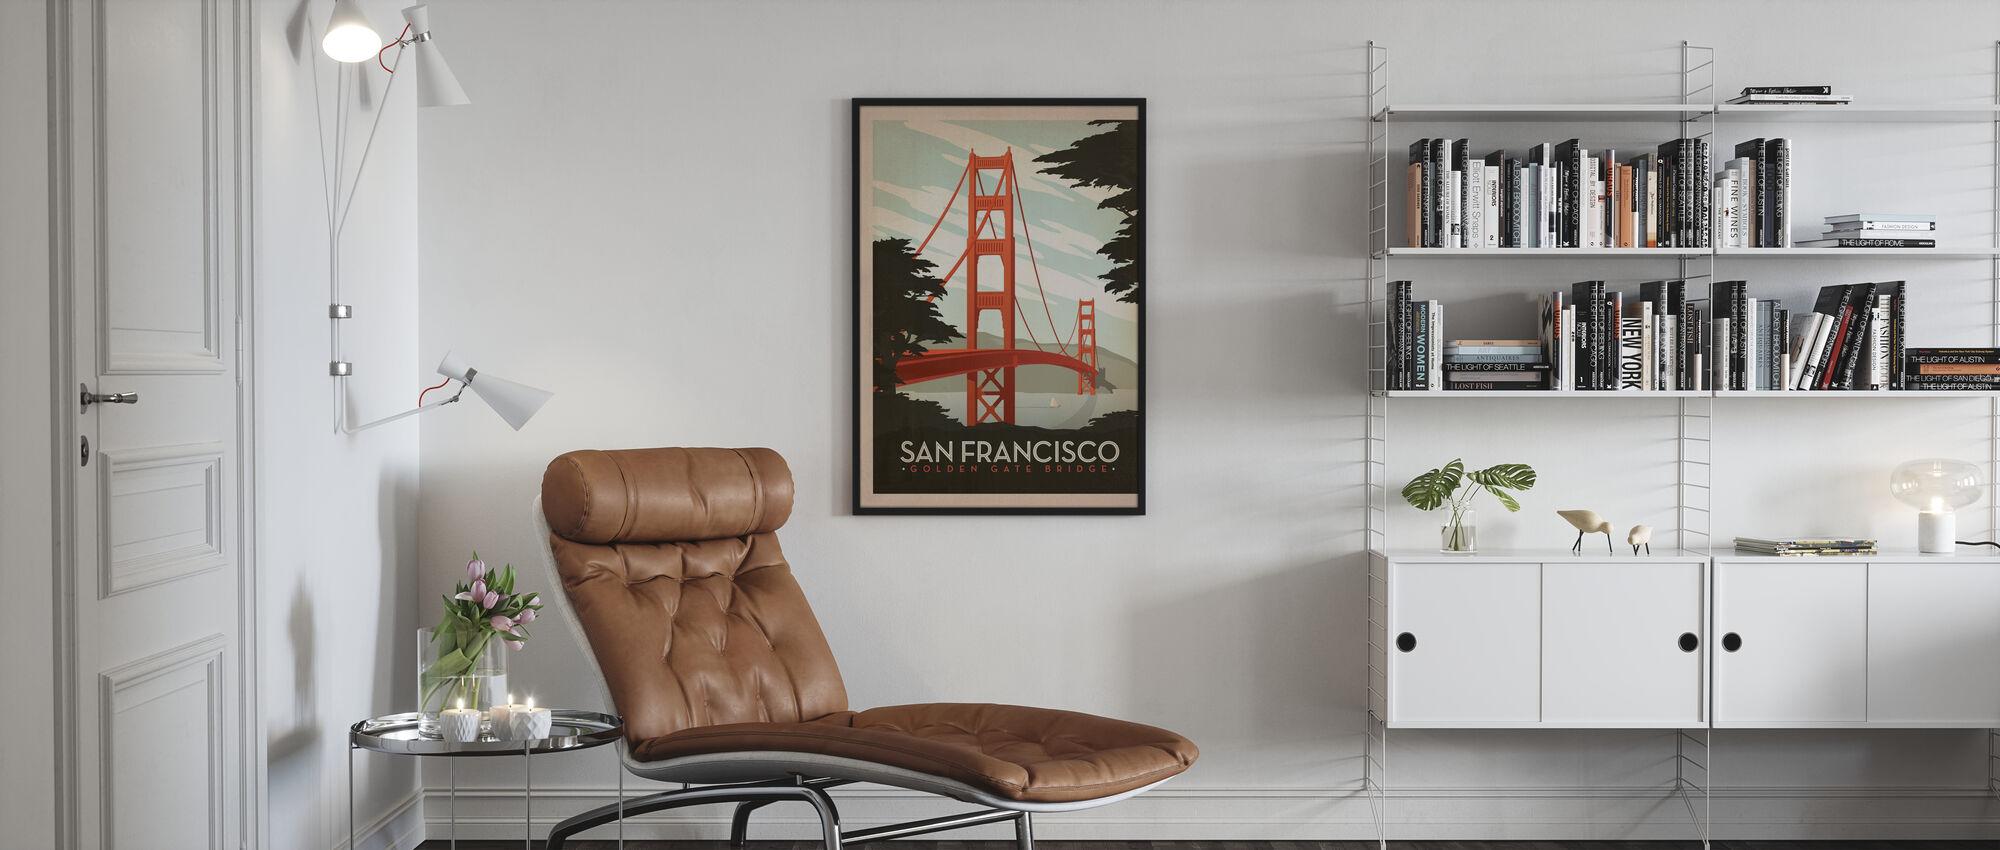 San Francisco - Poster - Living Room